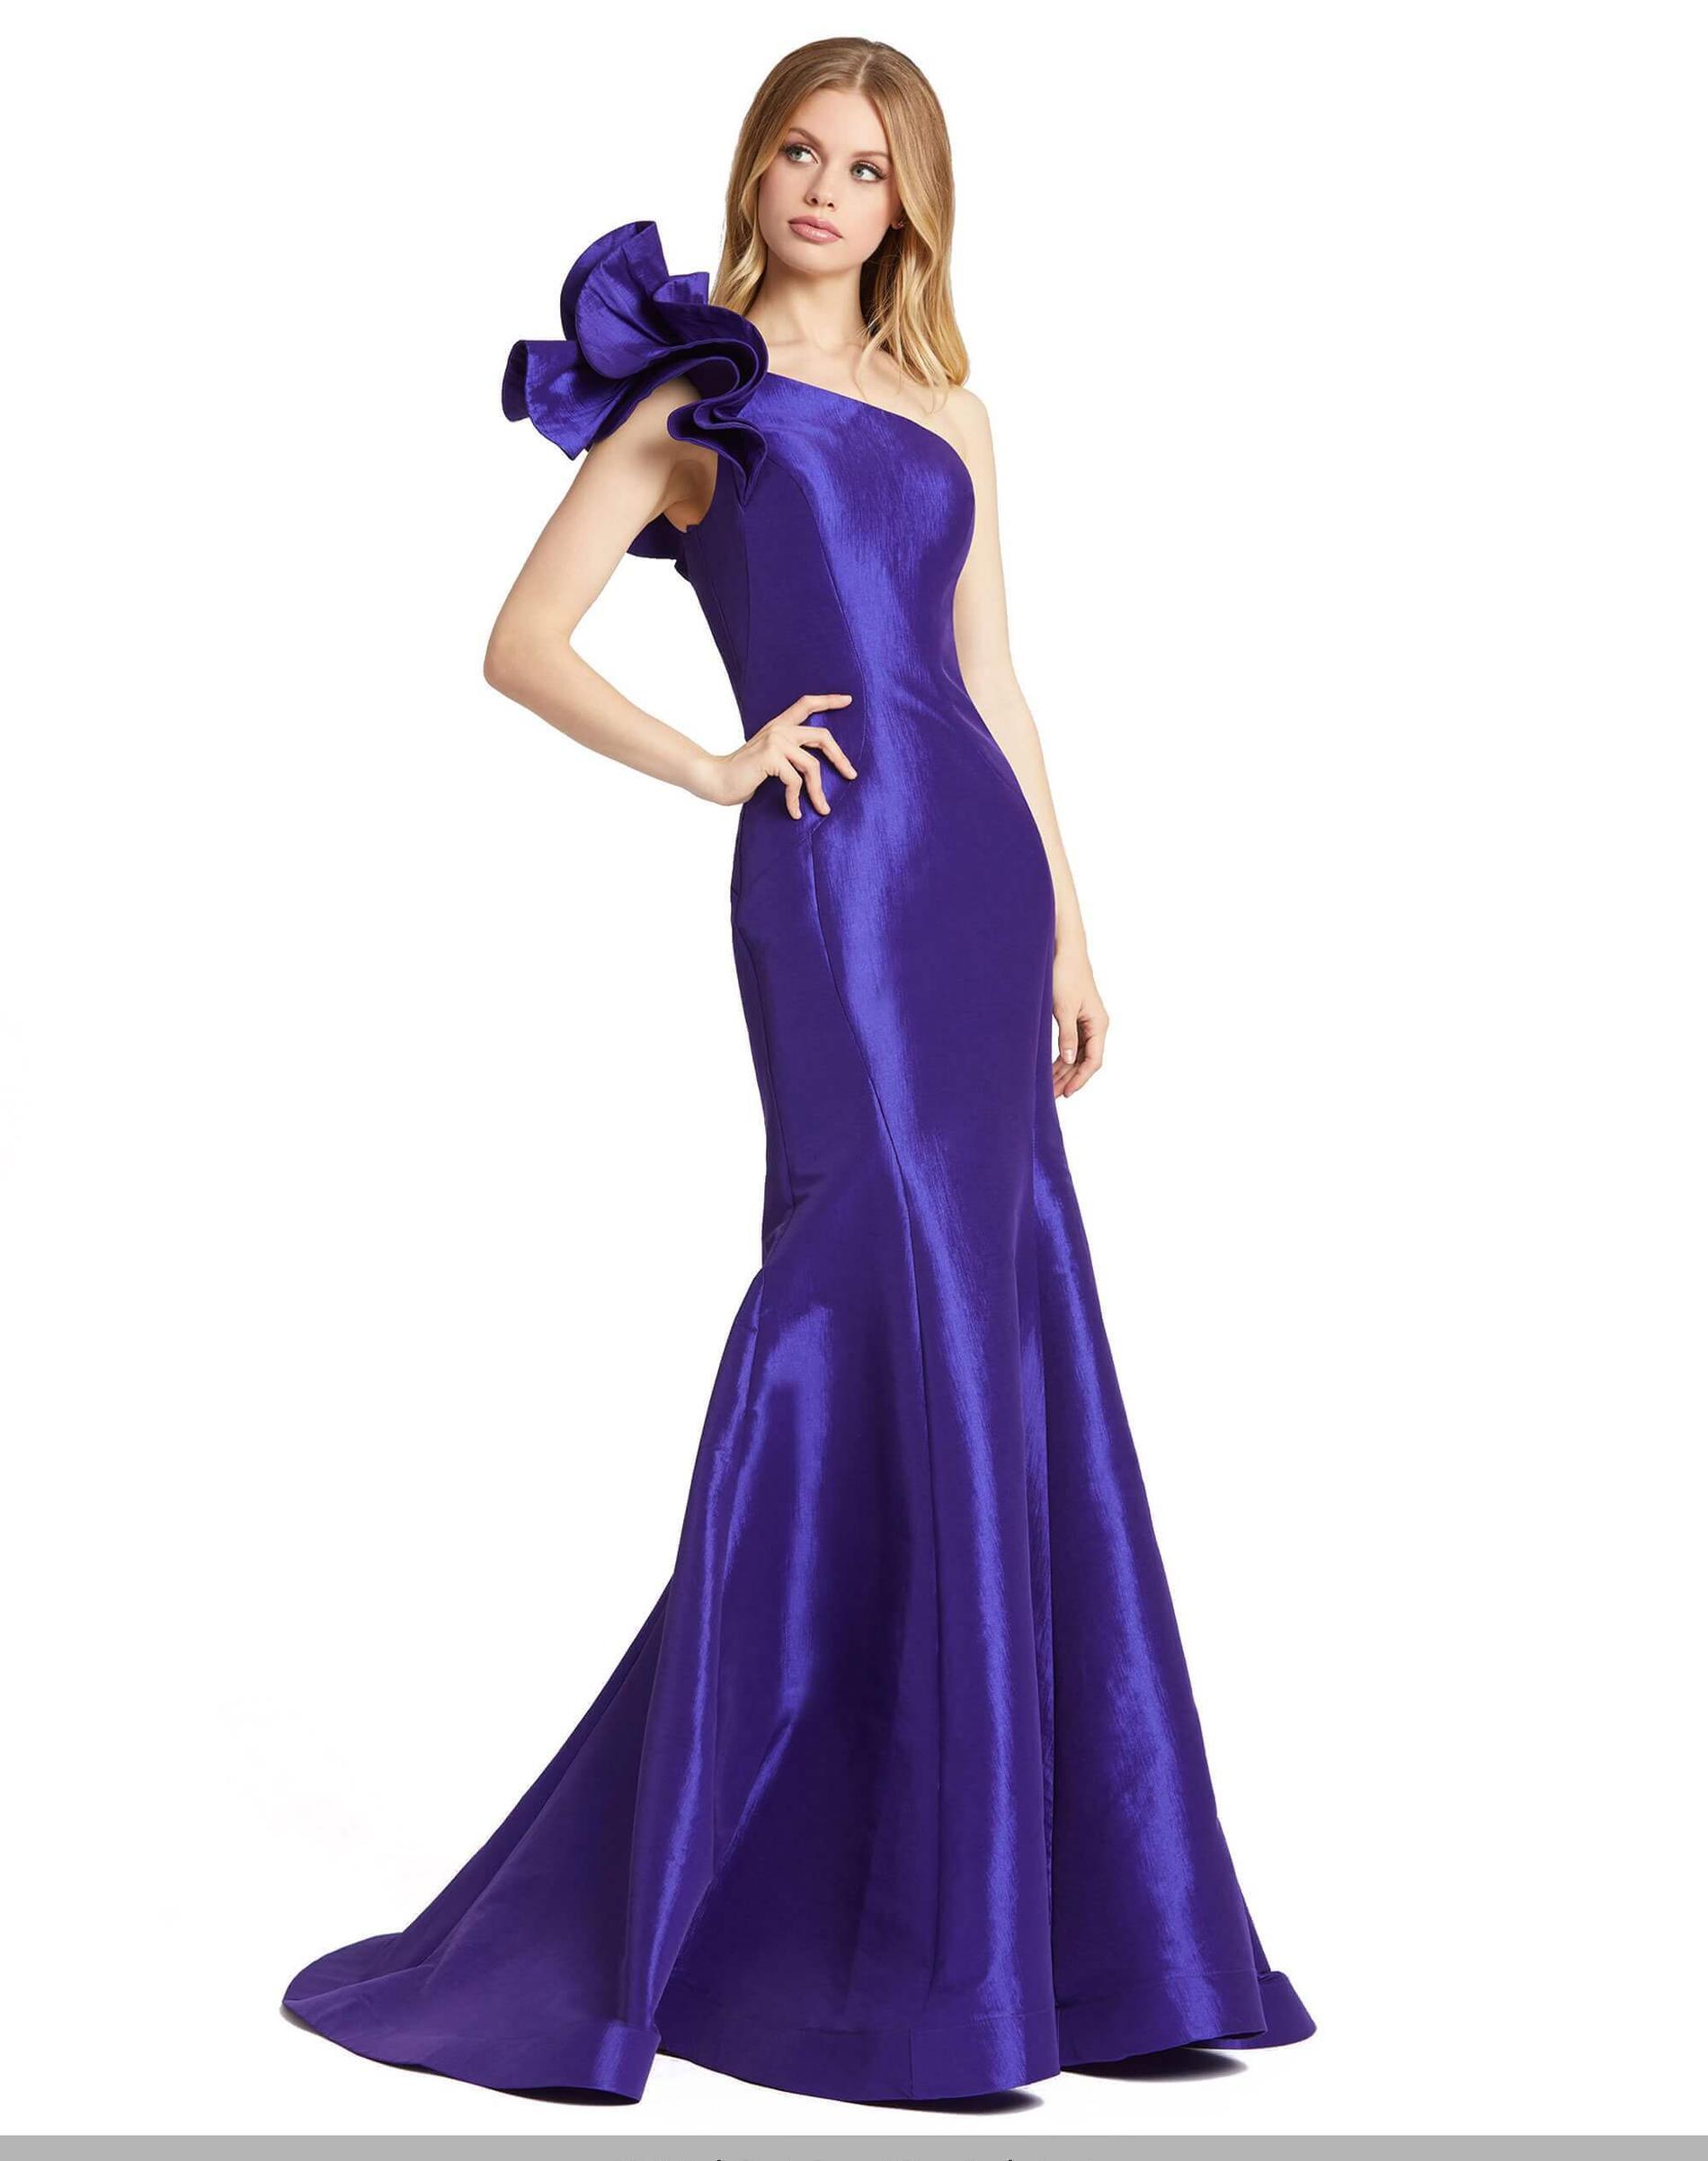 Style 67379 Mac Duggal Purple Size 2 Ruffles One Shoulder Prom Silk Mermaid Dress on Queenly